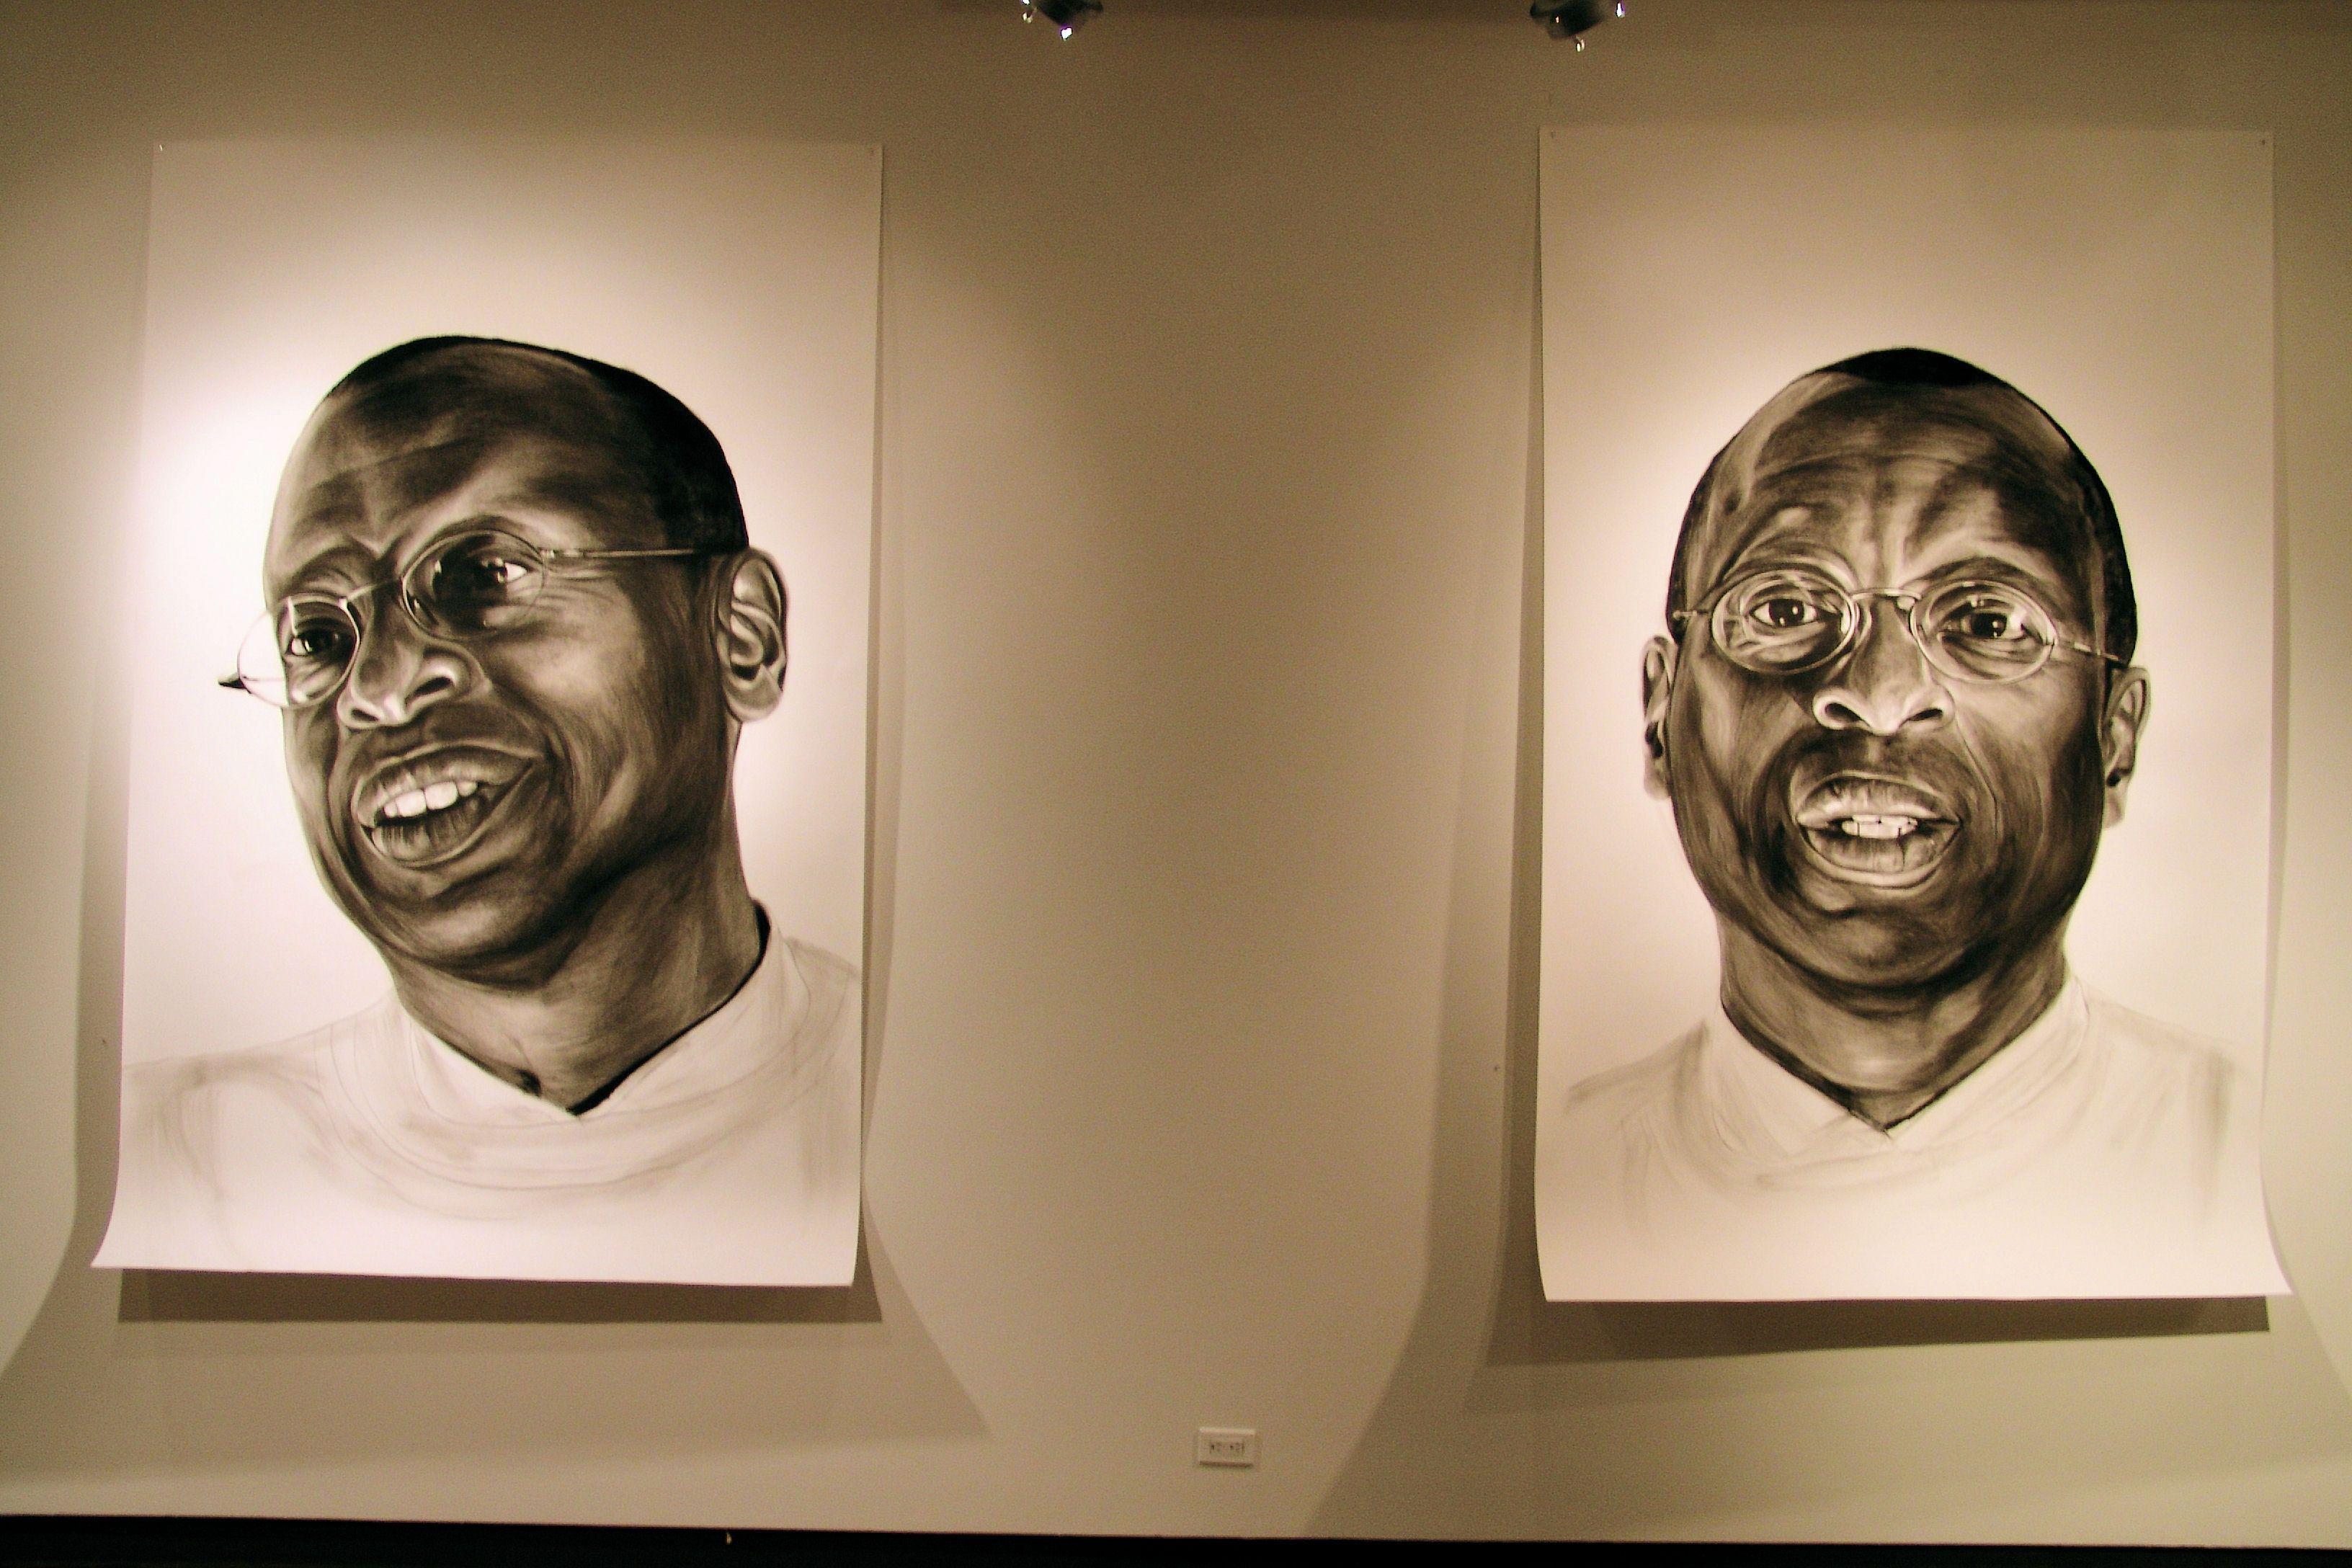 Ethelbert (Big Heads), SVA Fine Arts Gallery, NYC, 2006 by Pete Petrine